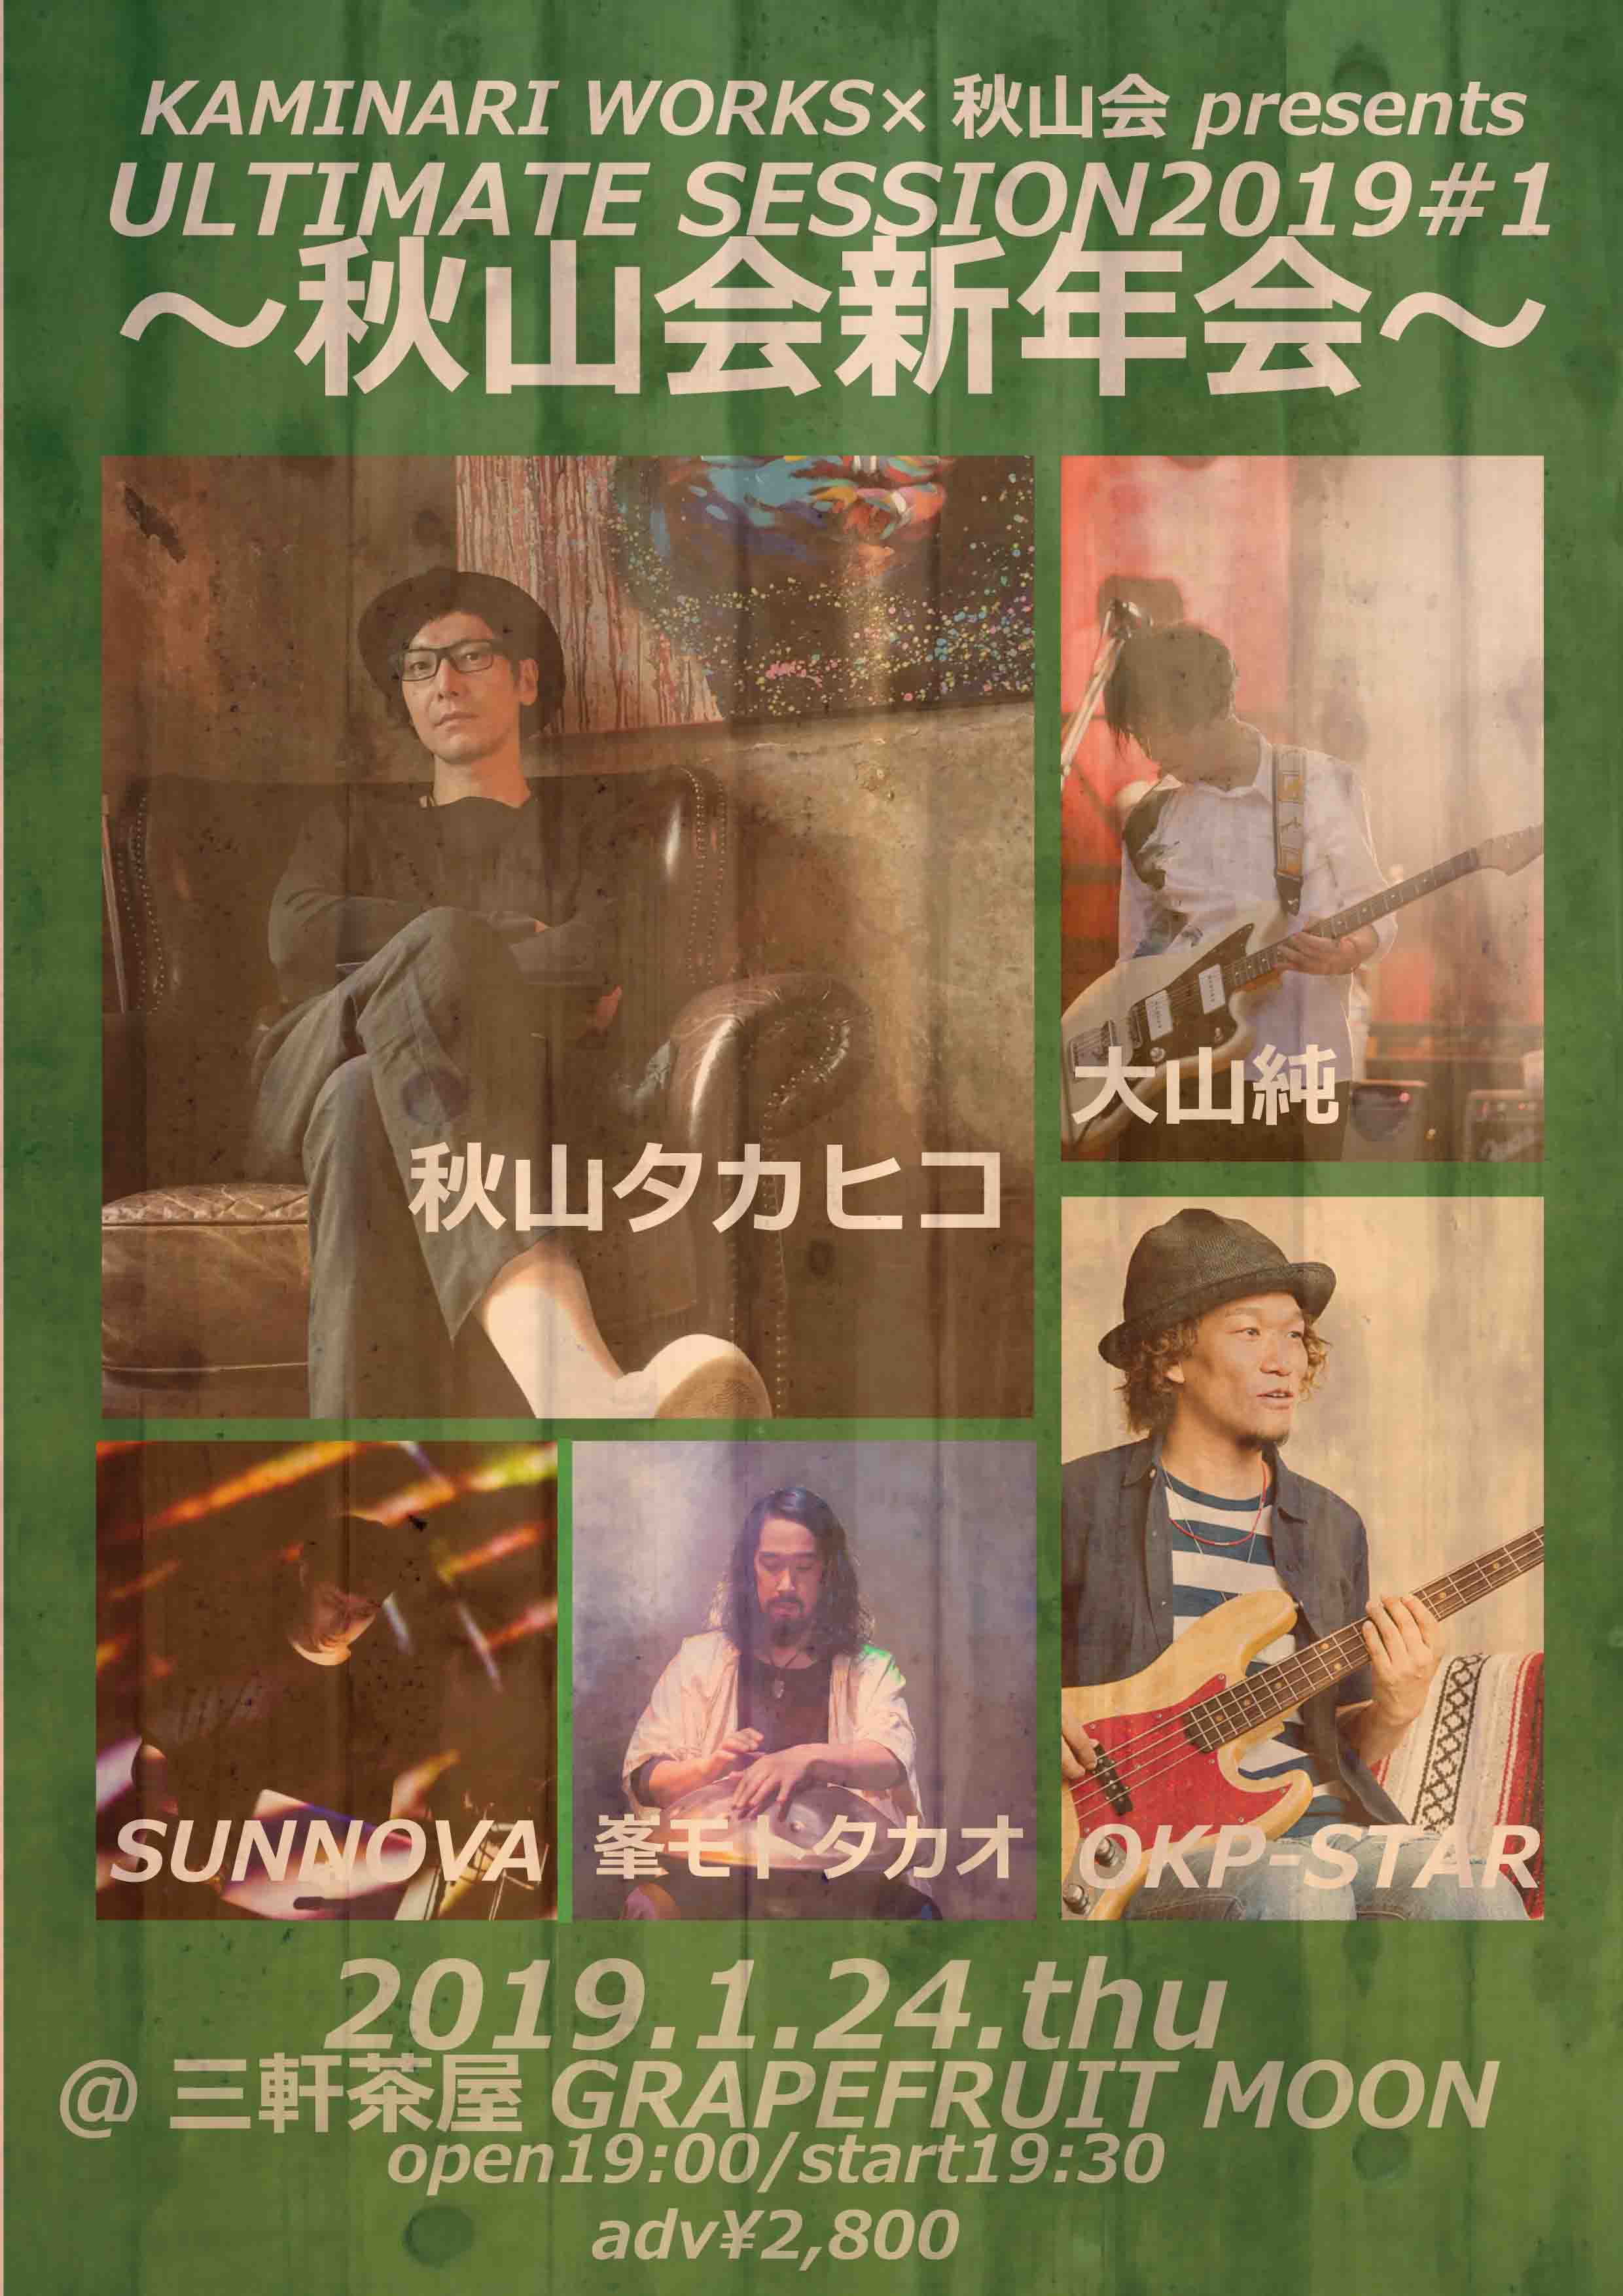 KAMINARI WORKS×秋山会 presents 「ULTIMATE SESSION2019#1〜秋山会新年会」